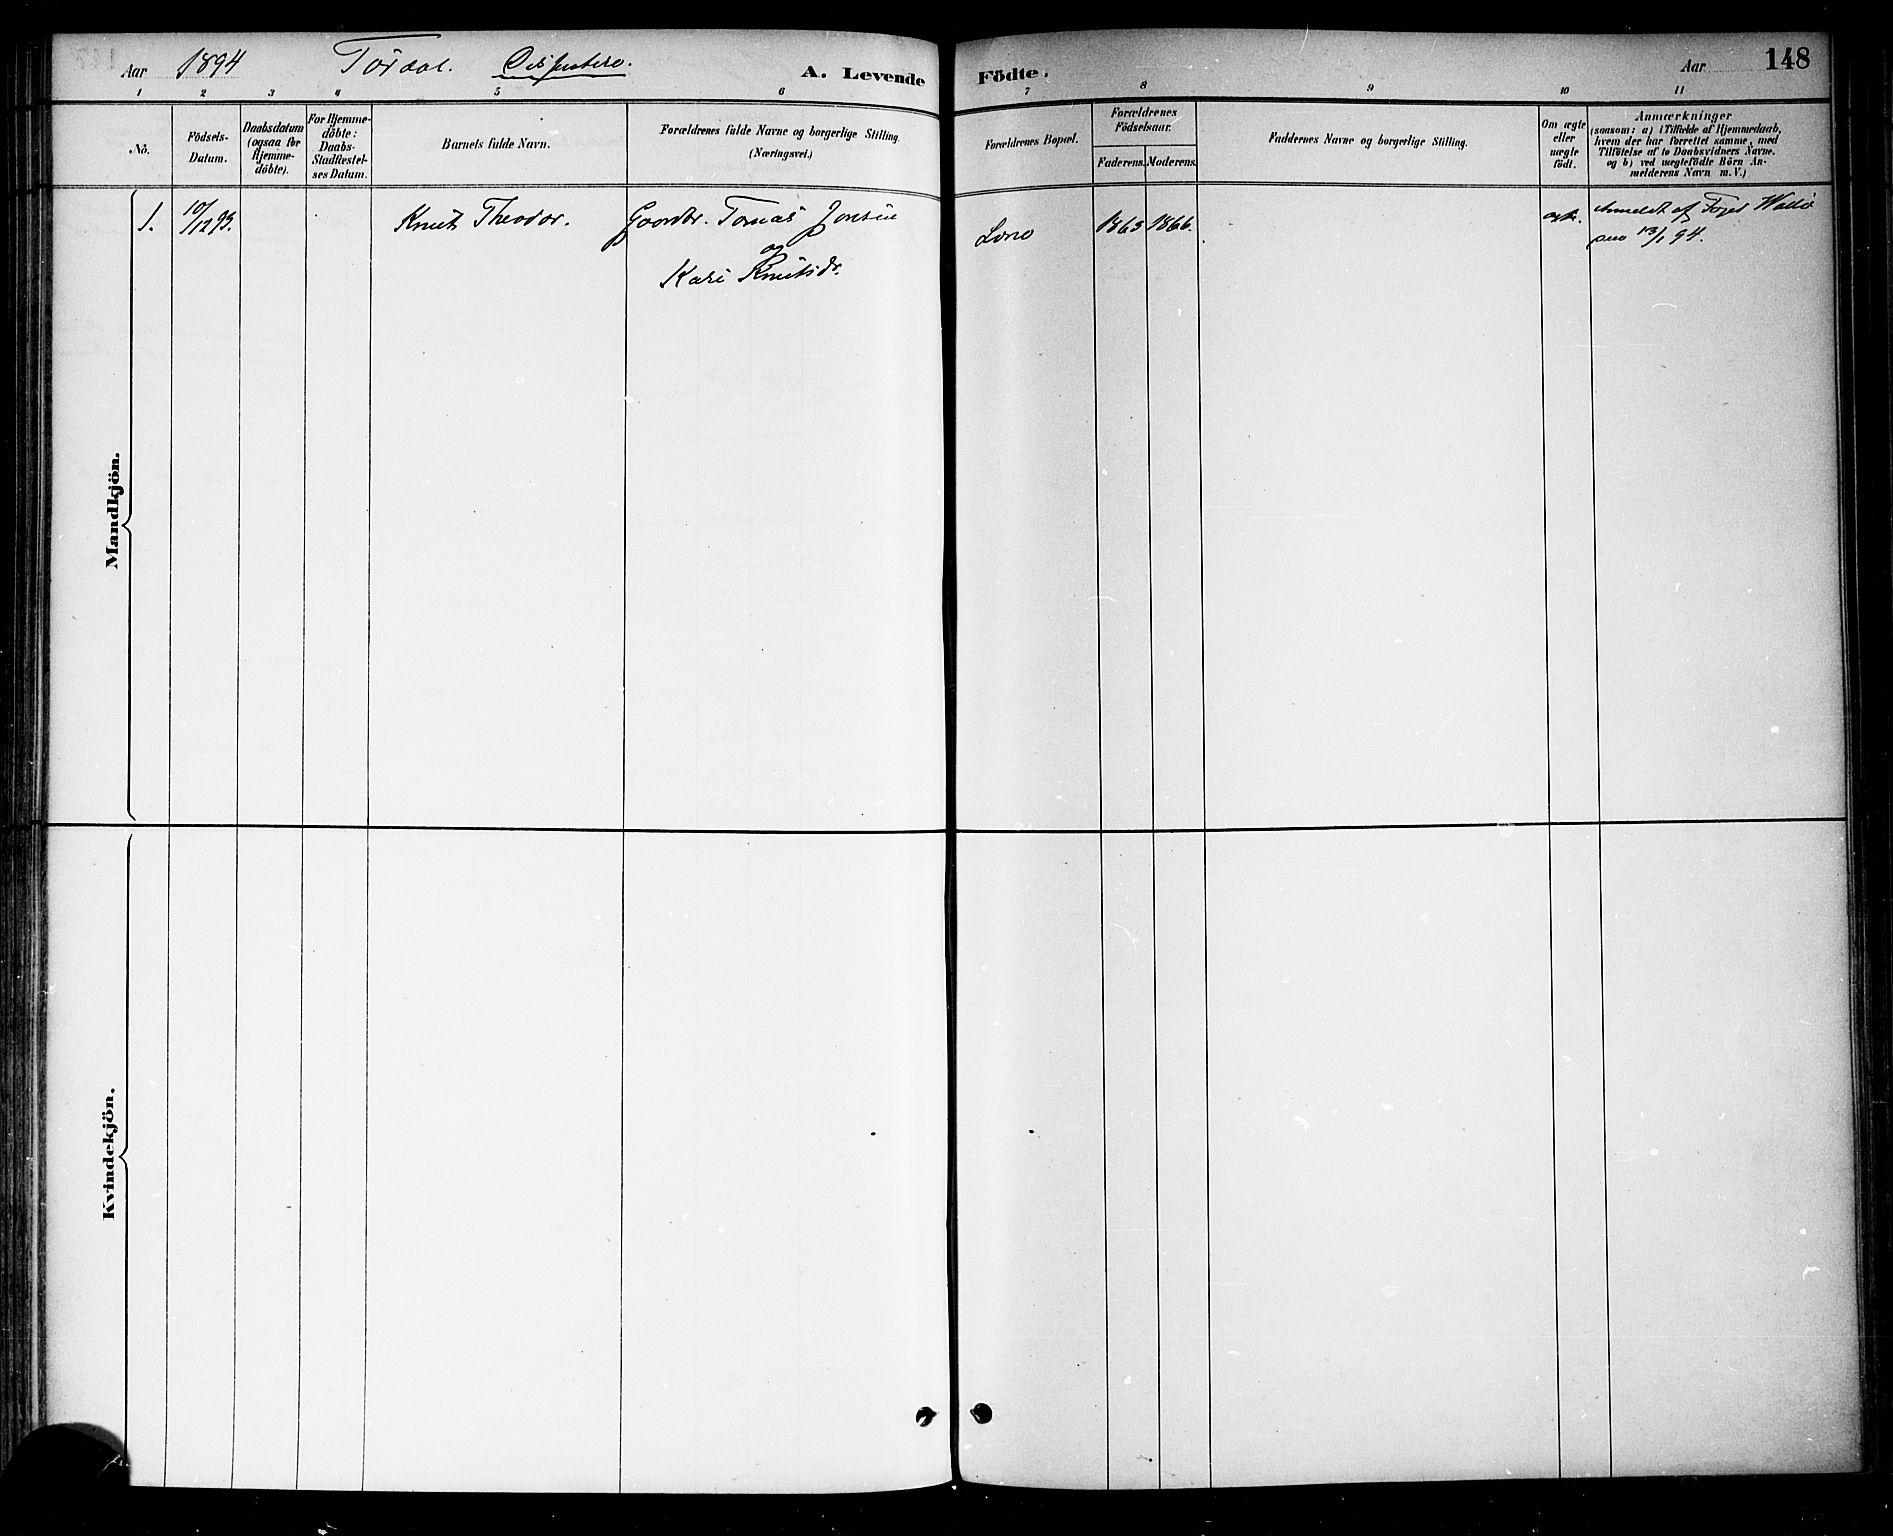 SAKO, Drangedal kirkebøker, F/Fa/L0010: Ministerialbok nr. 10 /2, 1885-1894, s. 148